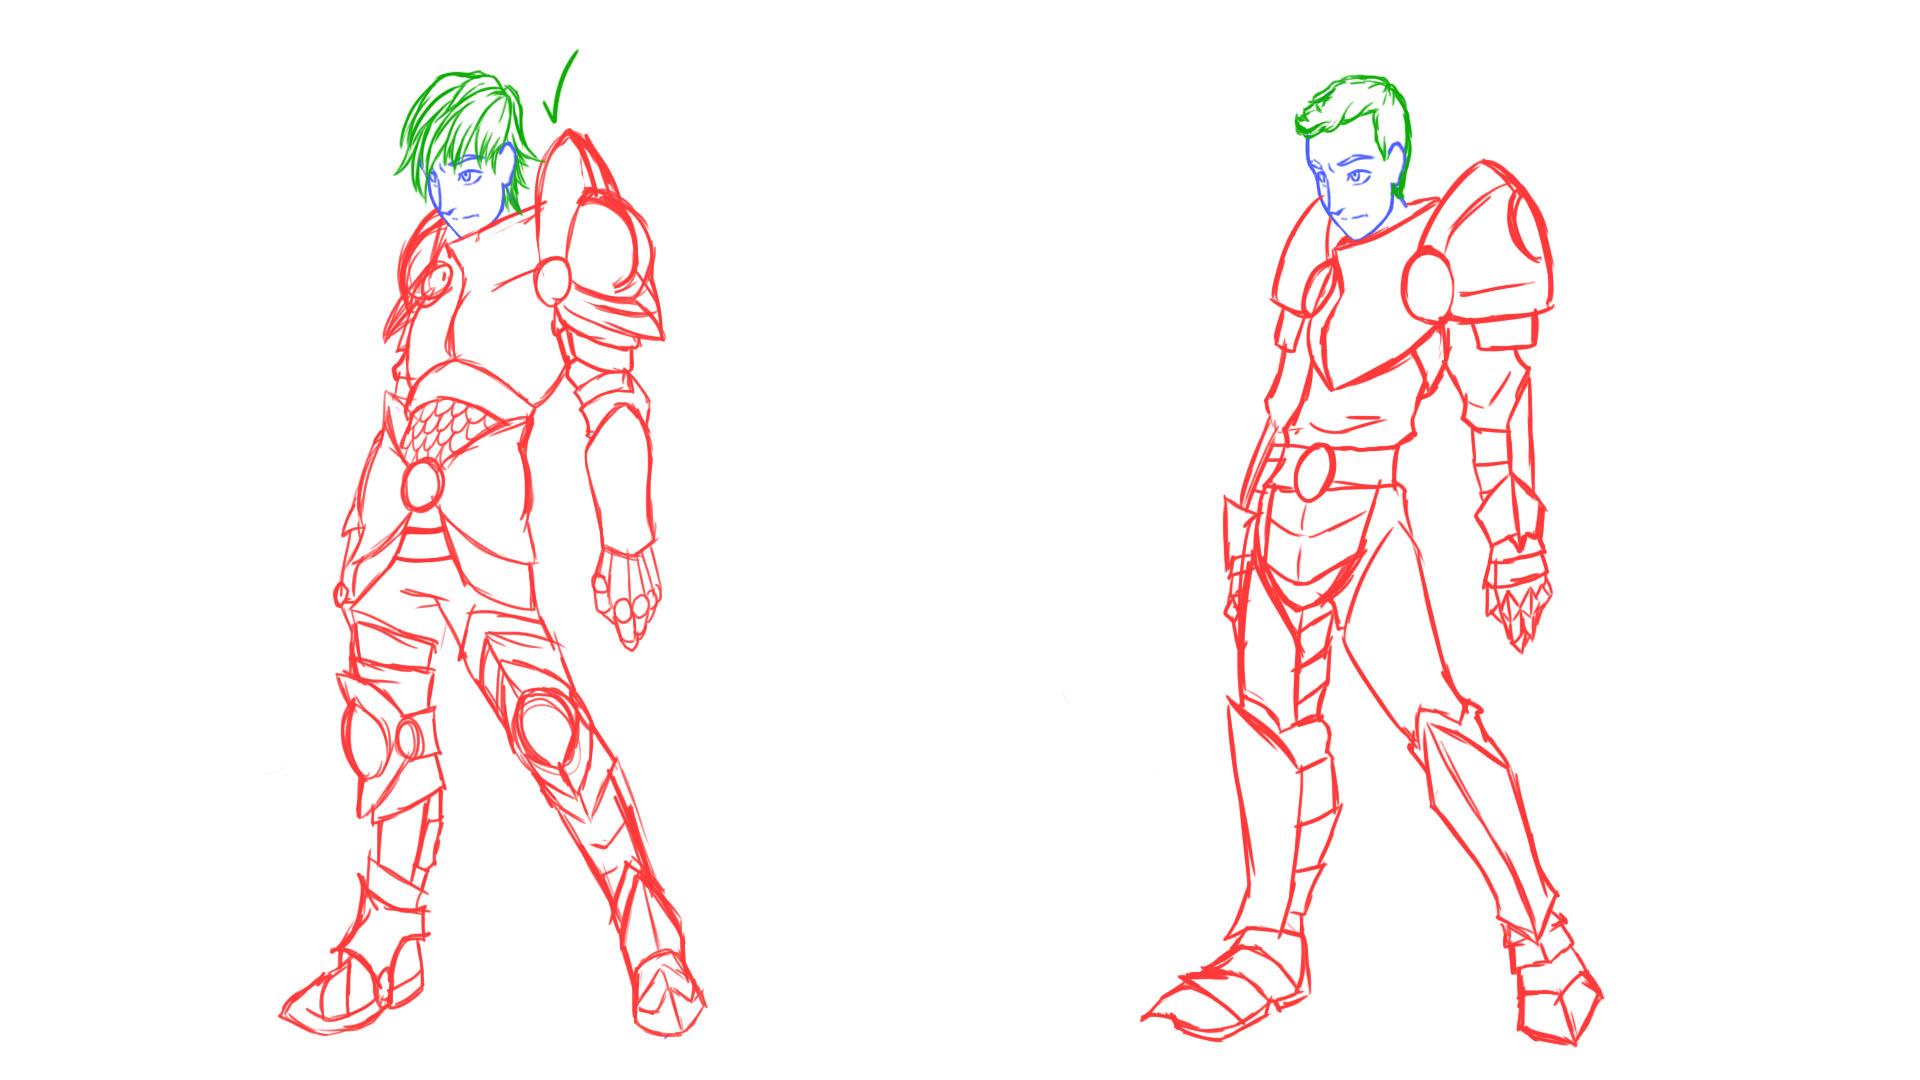 Nick: Armor Concept 1